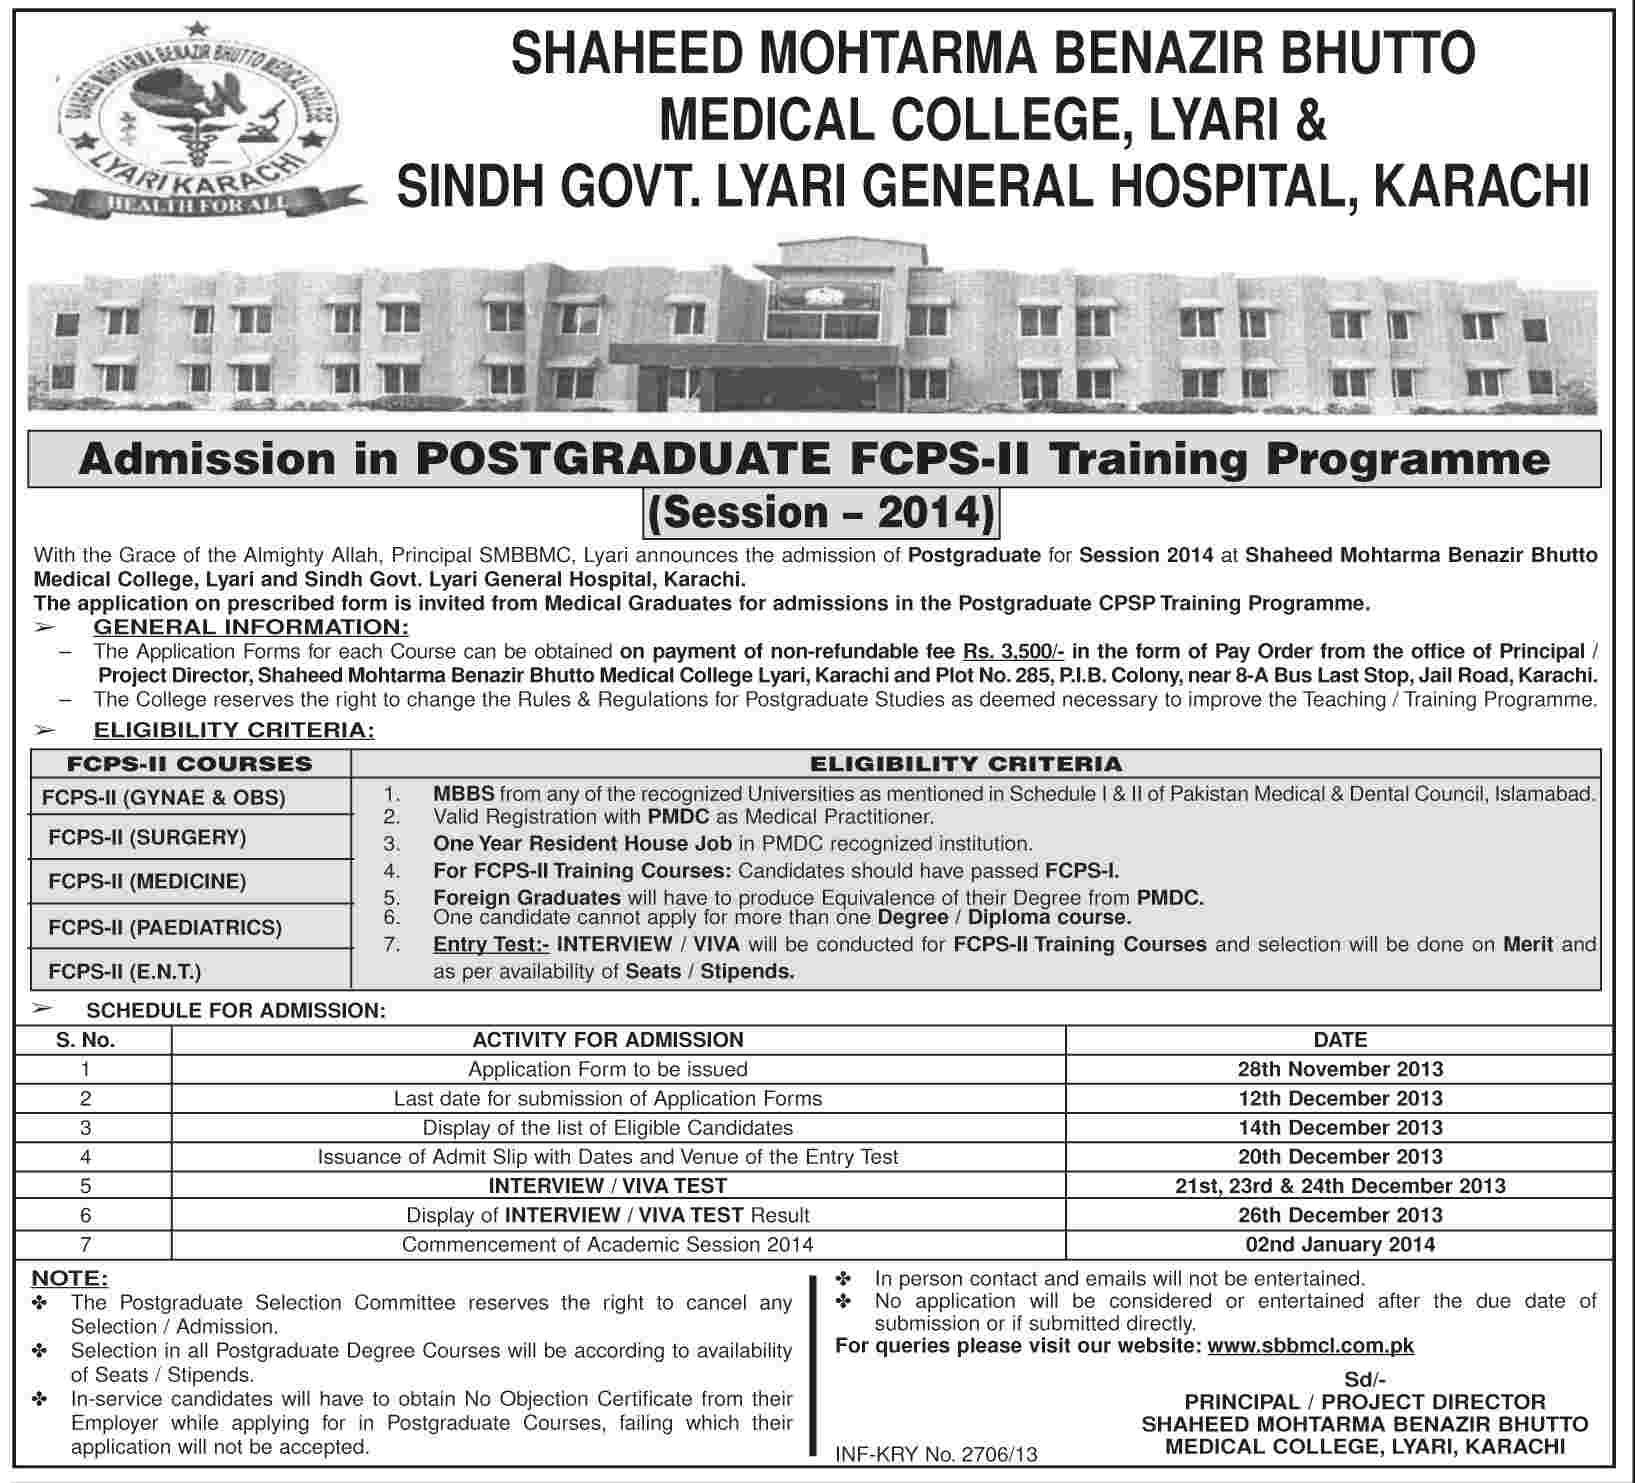 Shaheed Mohtarma Benazir Bhutto Medical College Lyari Karachi Admission Notice 2013